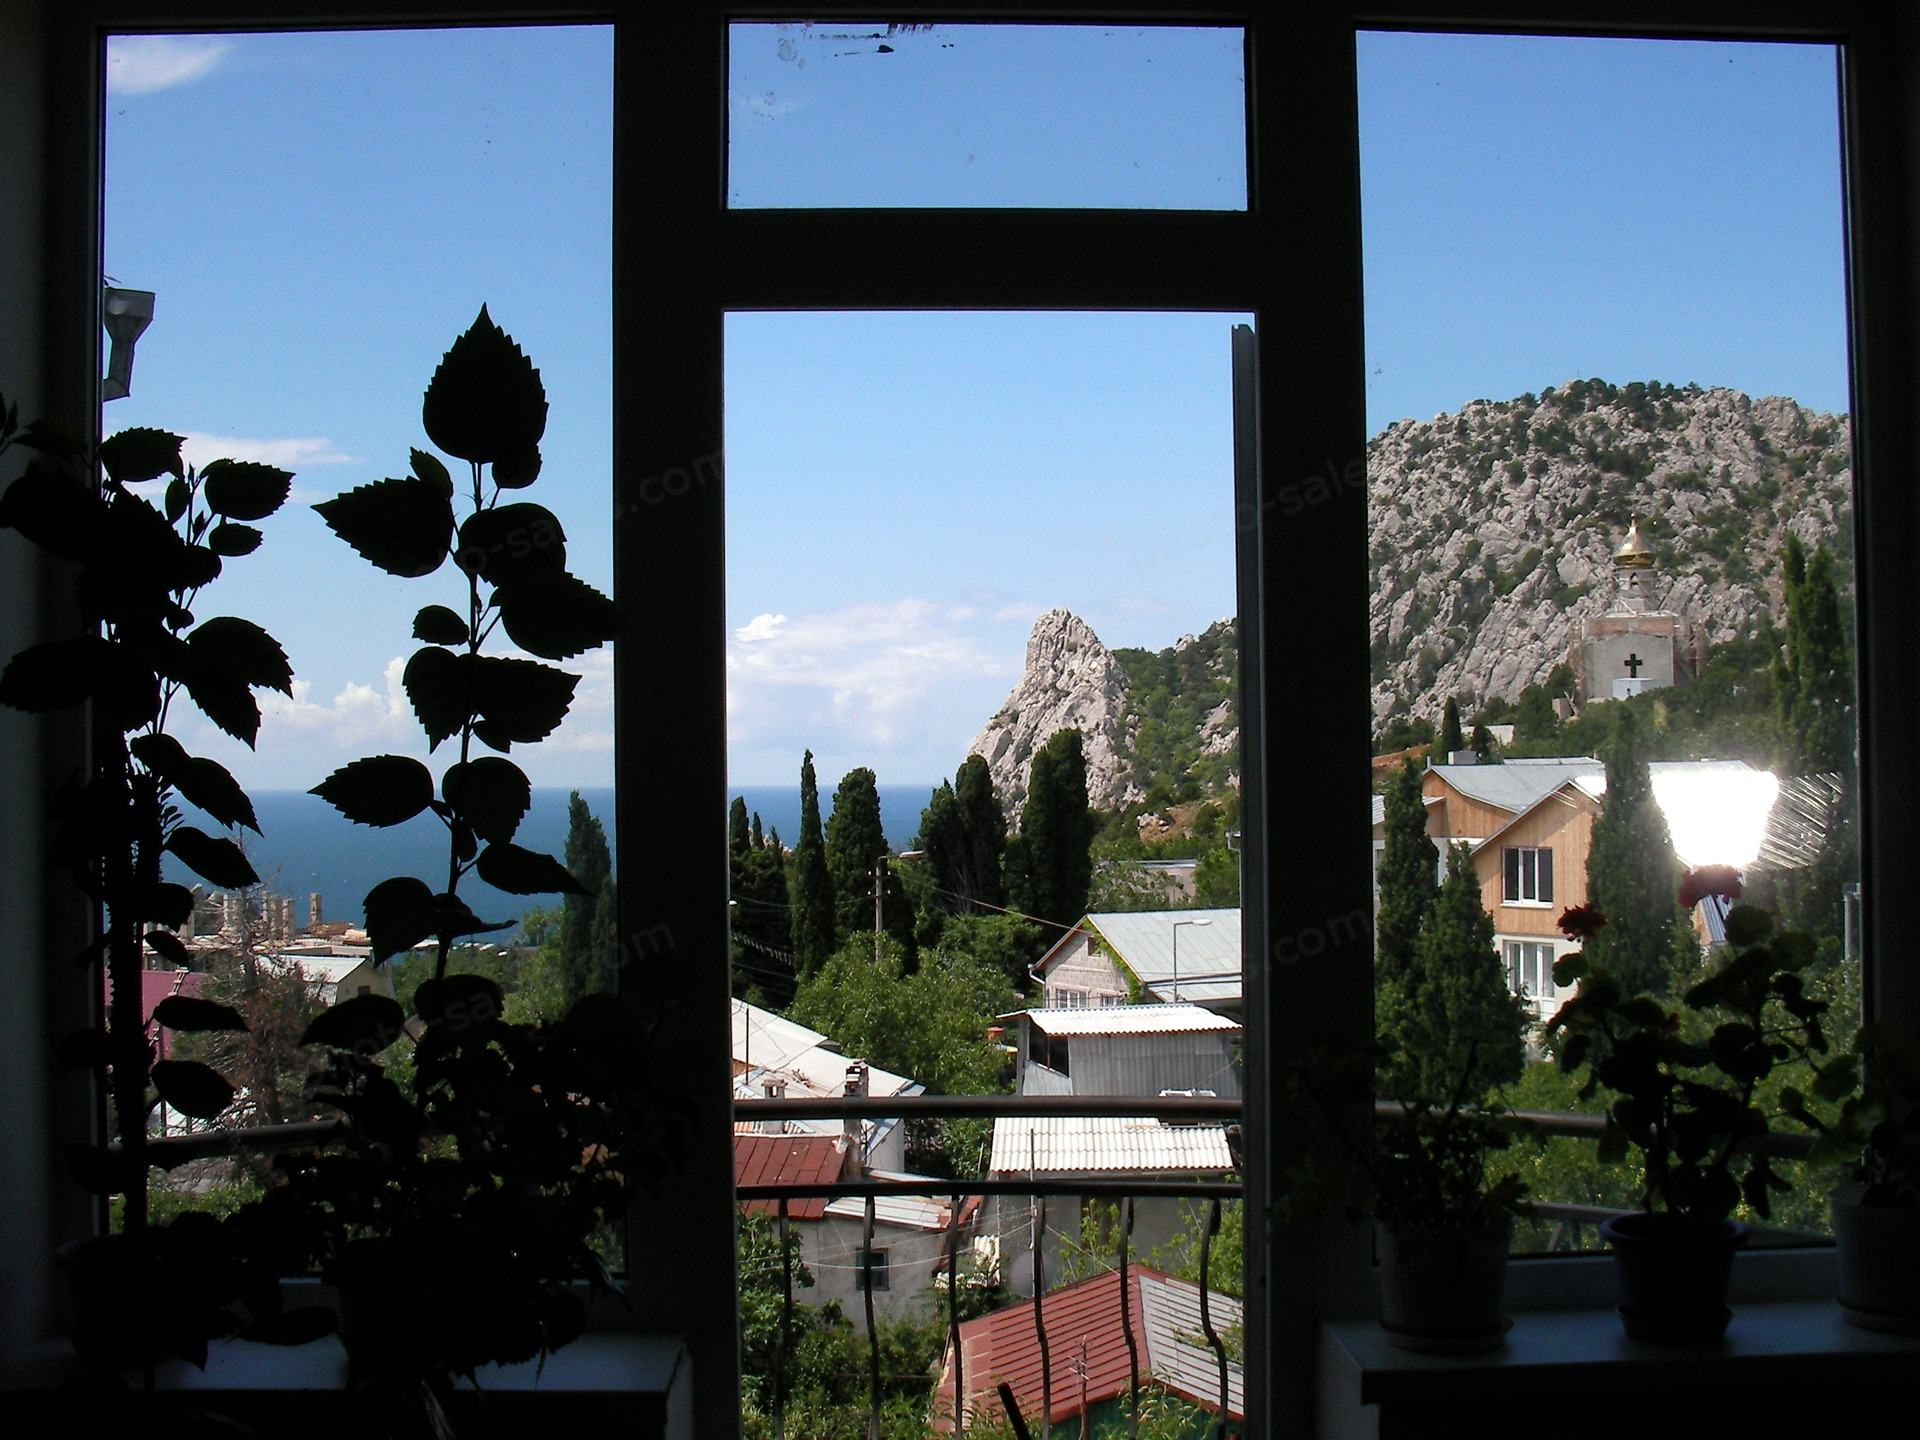 Window ကိုသမုဒ္ဒရာ၏အမြင်နှင့်တောင်များ